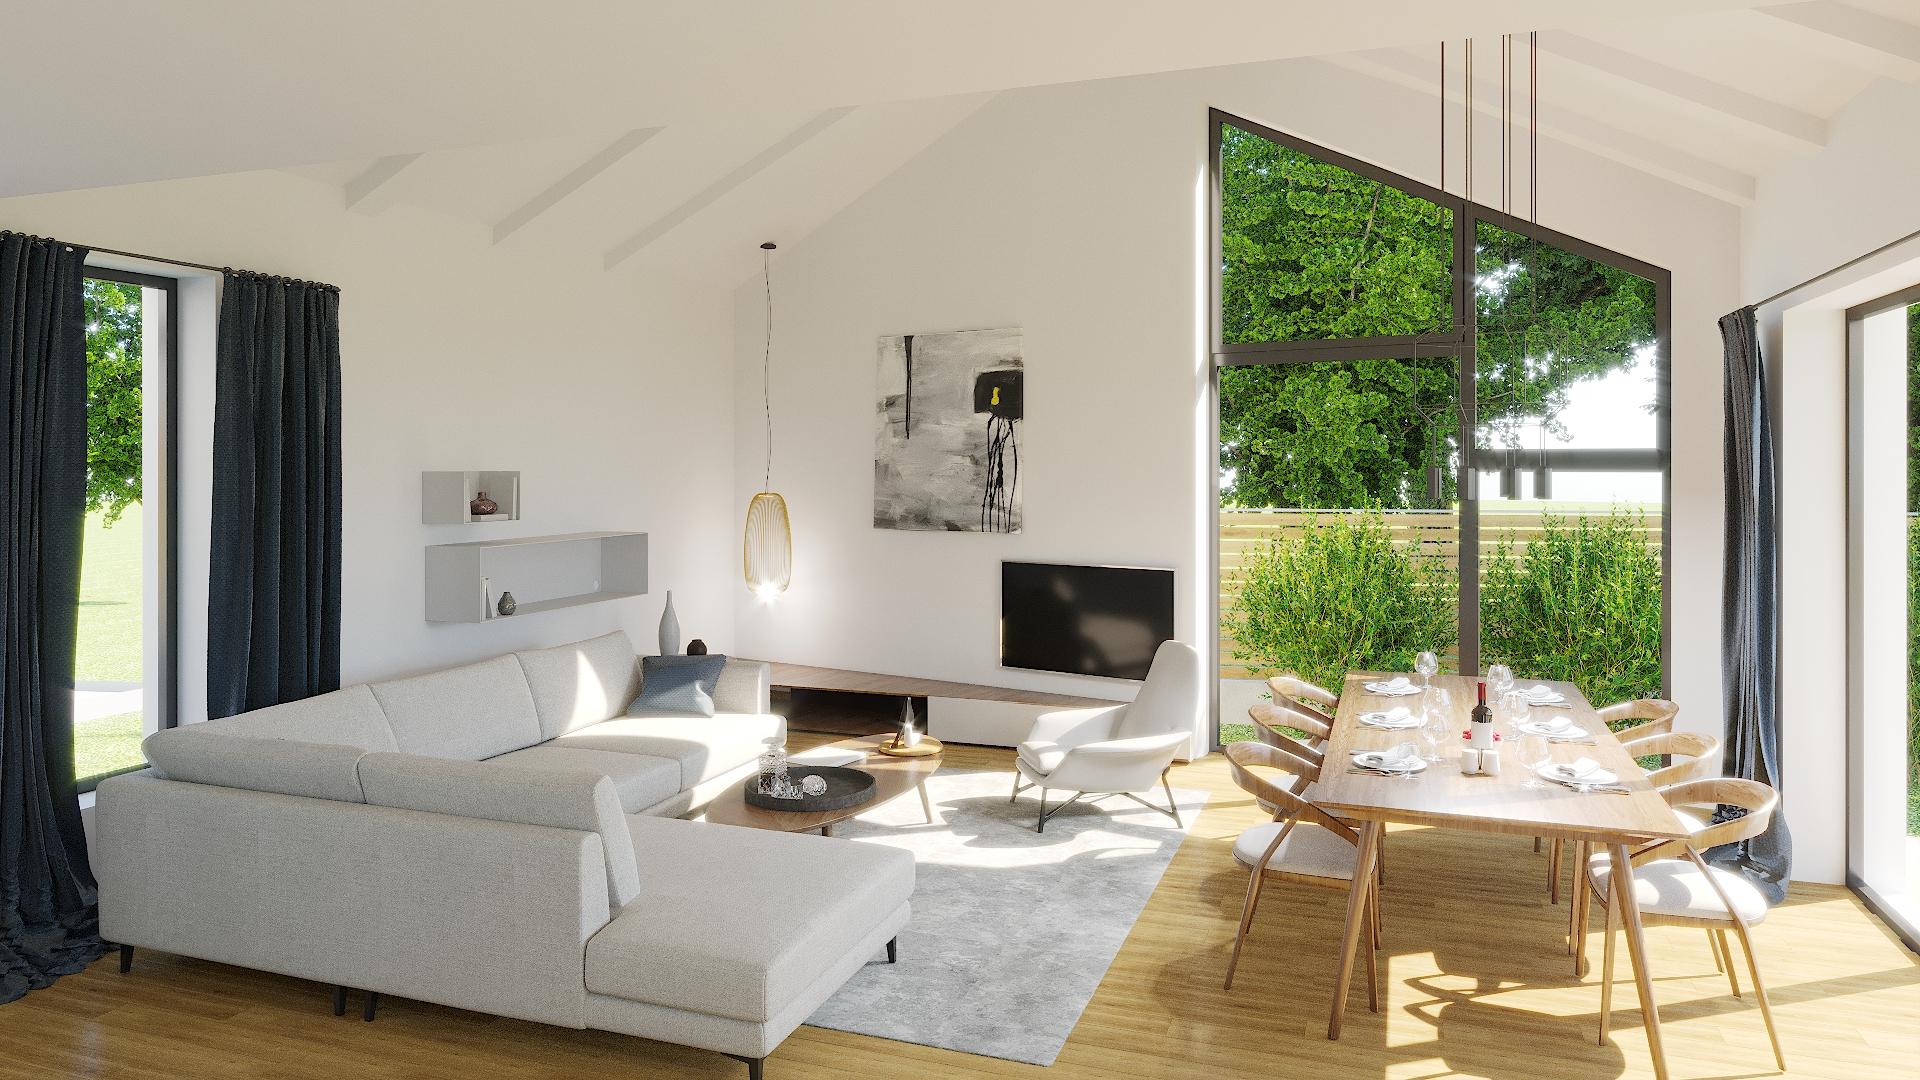 https://nbc-arhitect.ro/wp-content/uploads/2021/02/Balta-Alba-Corbeanca-Interior-1.jpg